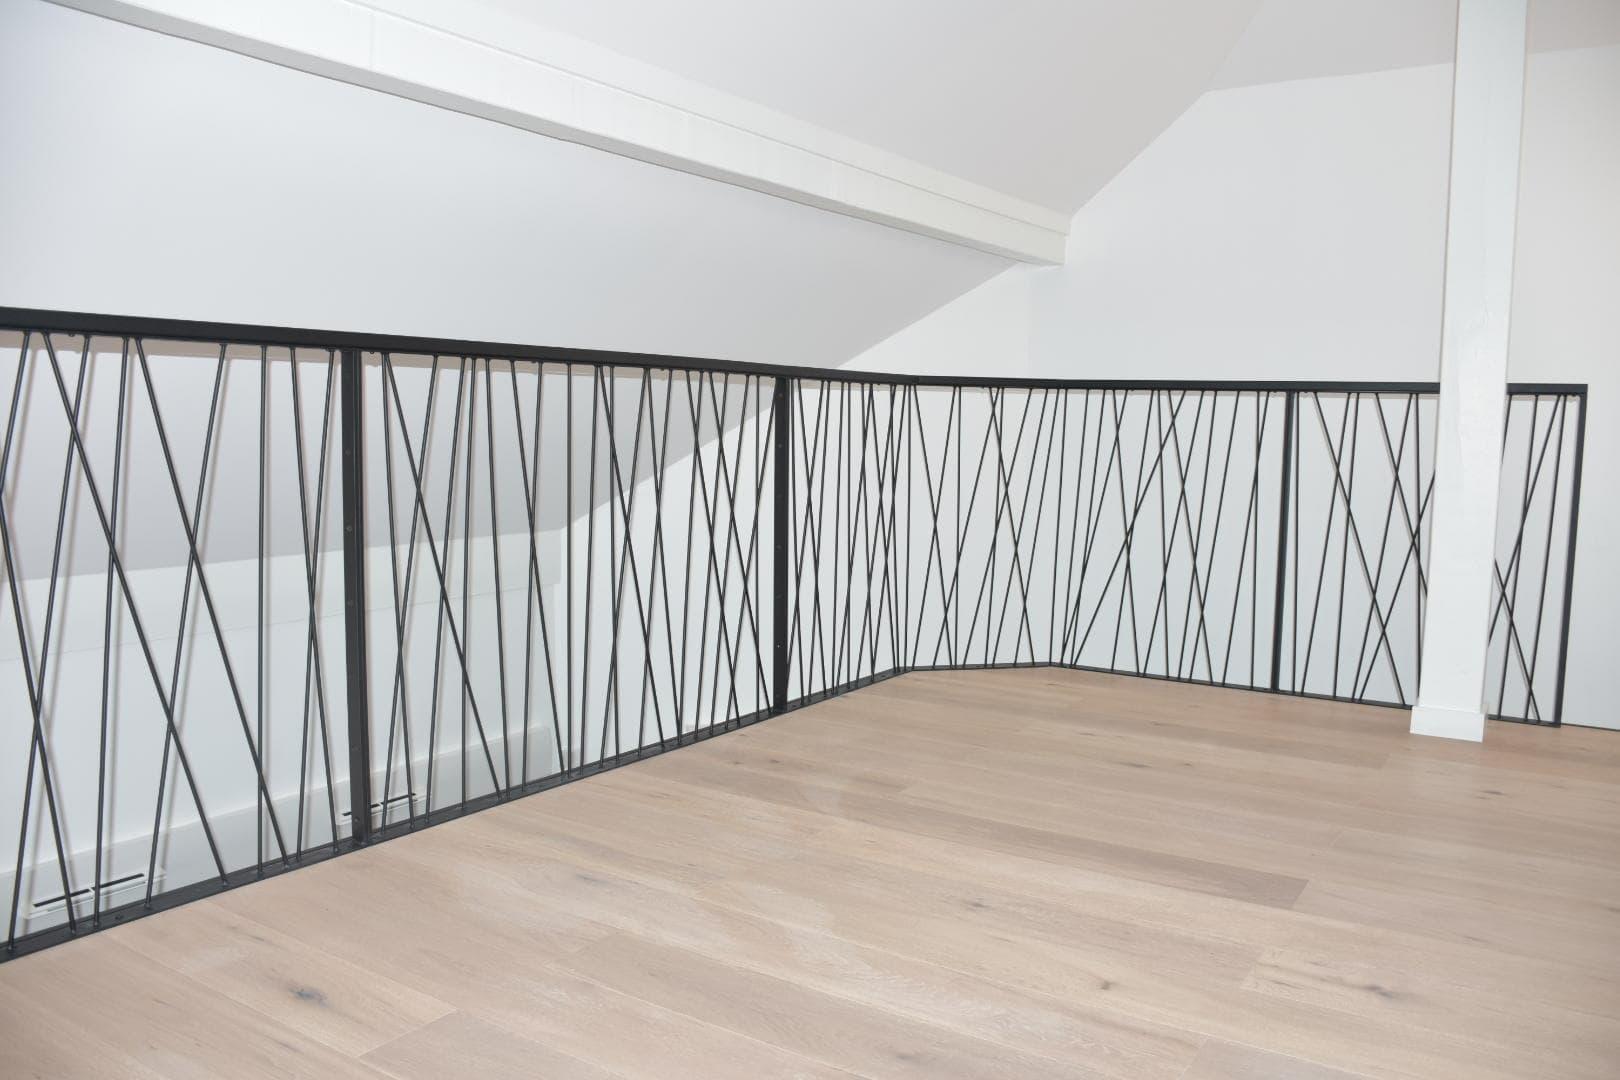 Garde-corps effet toile d'araignée ROBI Annecy (74)2